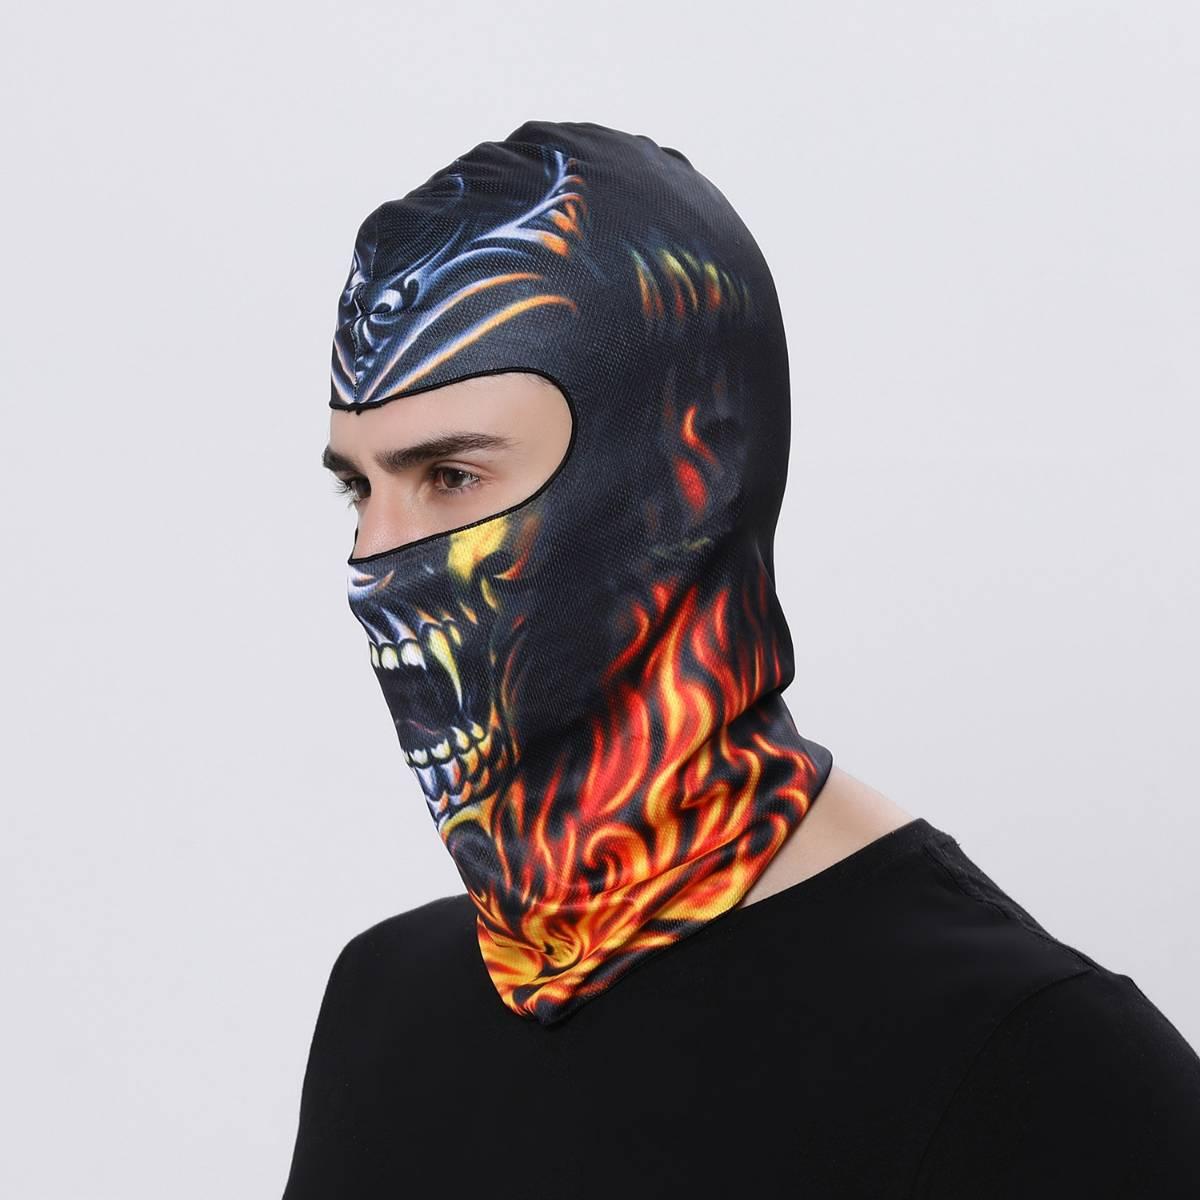 Masker Motor / Sepeda / Olah Raga Balaclava Motif 100